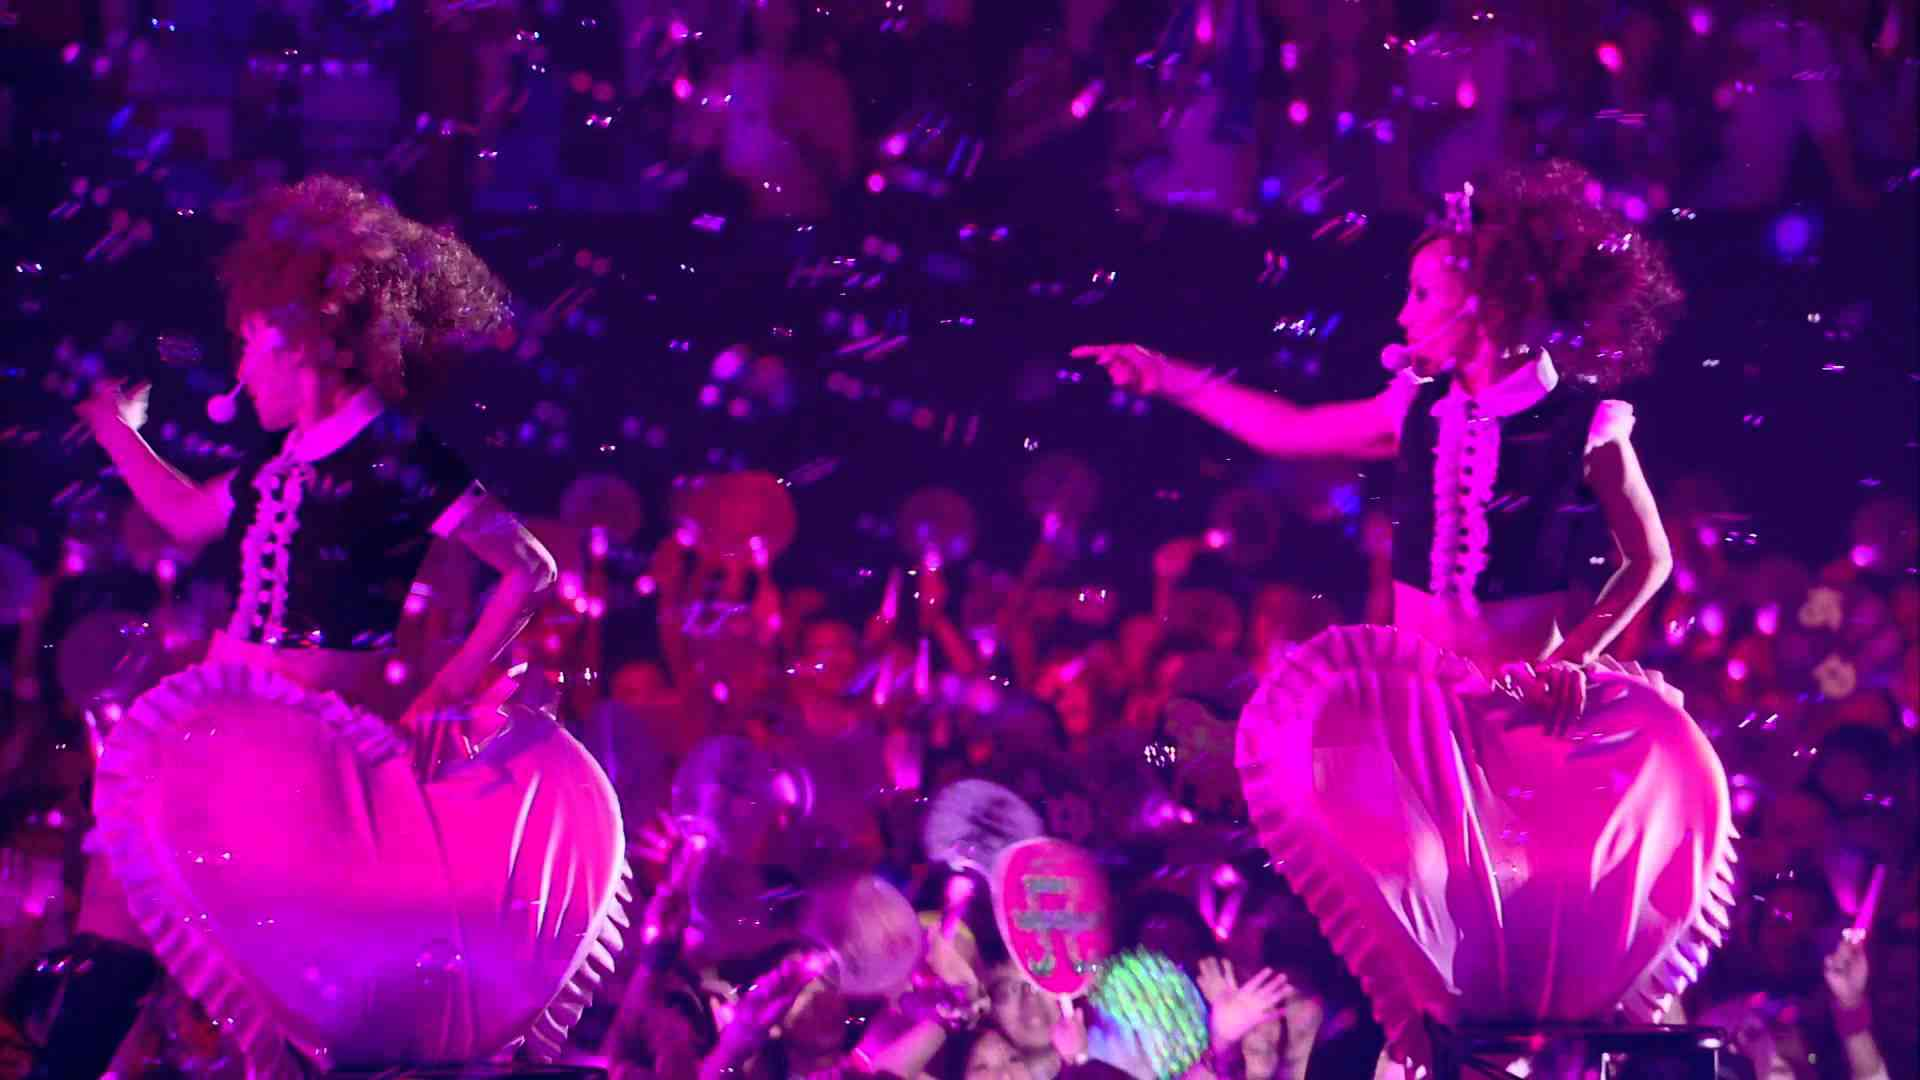 ayumi hamasaki ARENA TOUR 2012 A ~HOTEL Love songs~ -Shake It♥- [Blu-rayHD] - YouTube